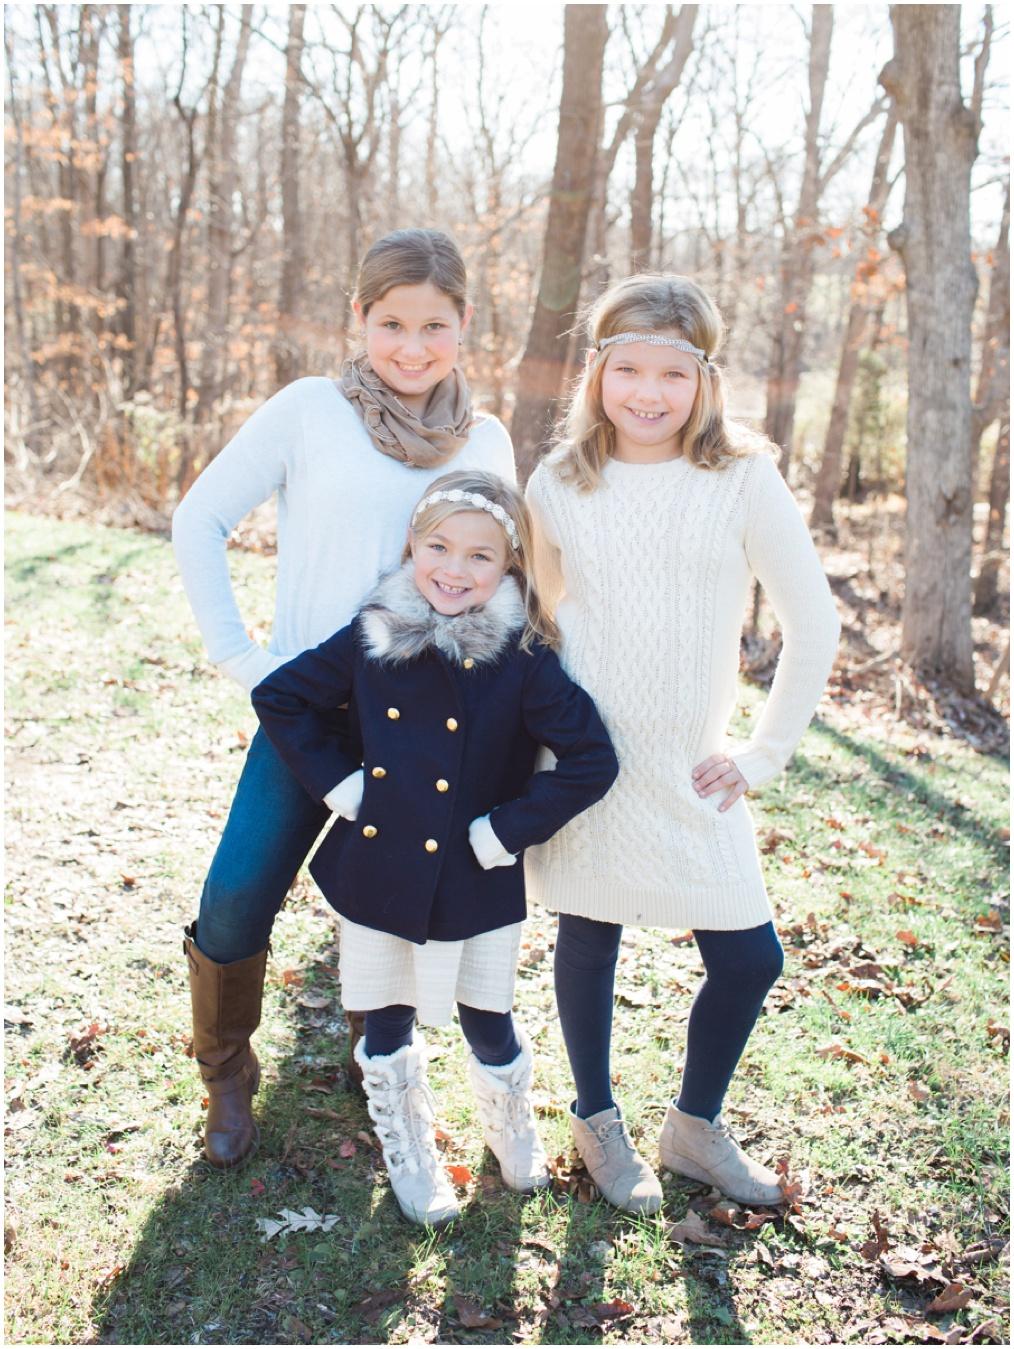 family-session-photos-st-louis1.jpg